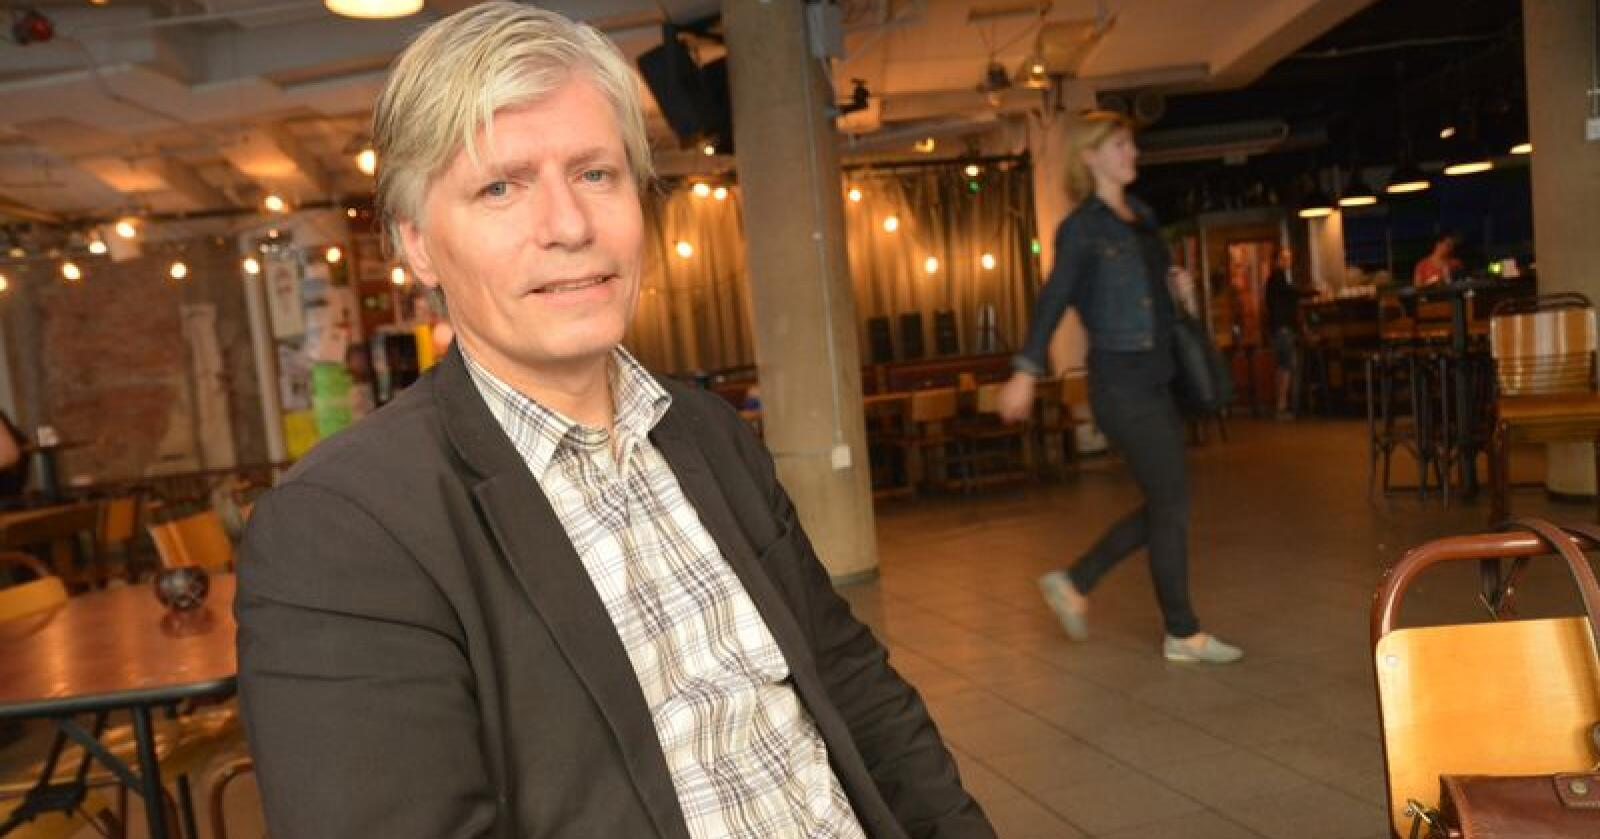 Nestleder Ola Elvestuen i Venstre er ny klima- og miljøminister. Bildet er tatt ved en tidligere anledning. Foto: Anders Sandbu